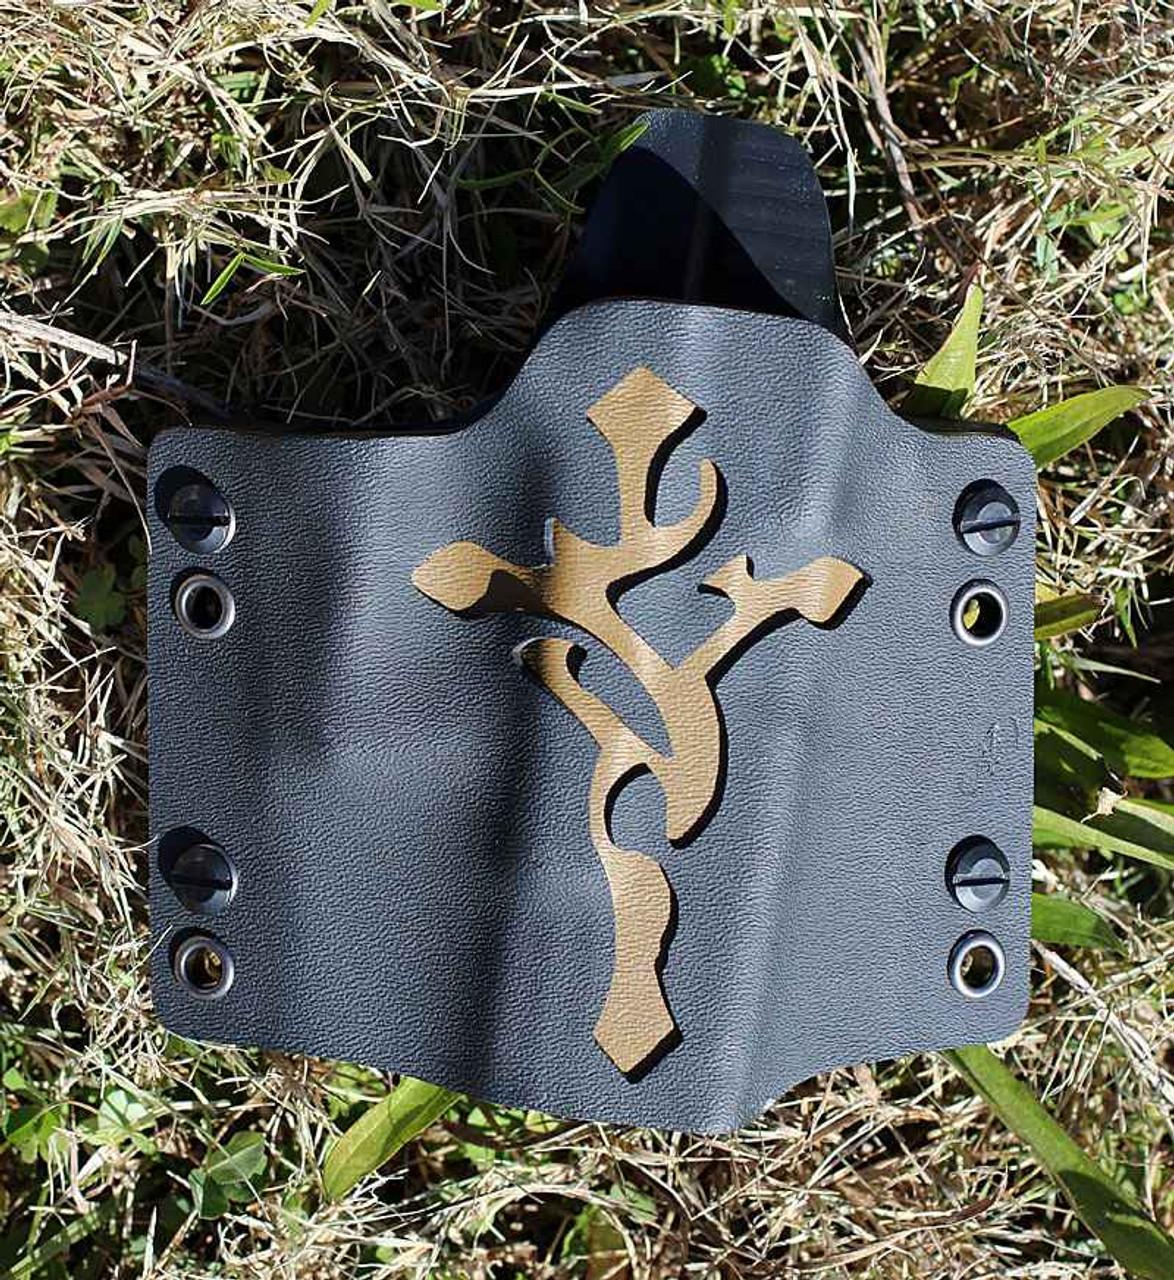 Concealment Custom Commander1, Right Hand, Glock 17, 22, 31, 19, 23, 32-Coyote Brown